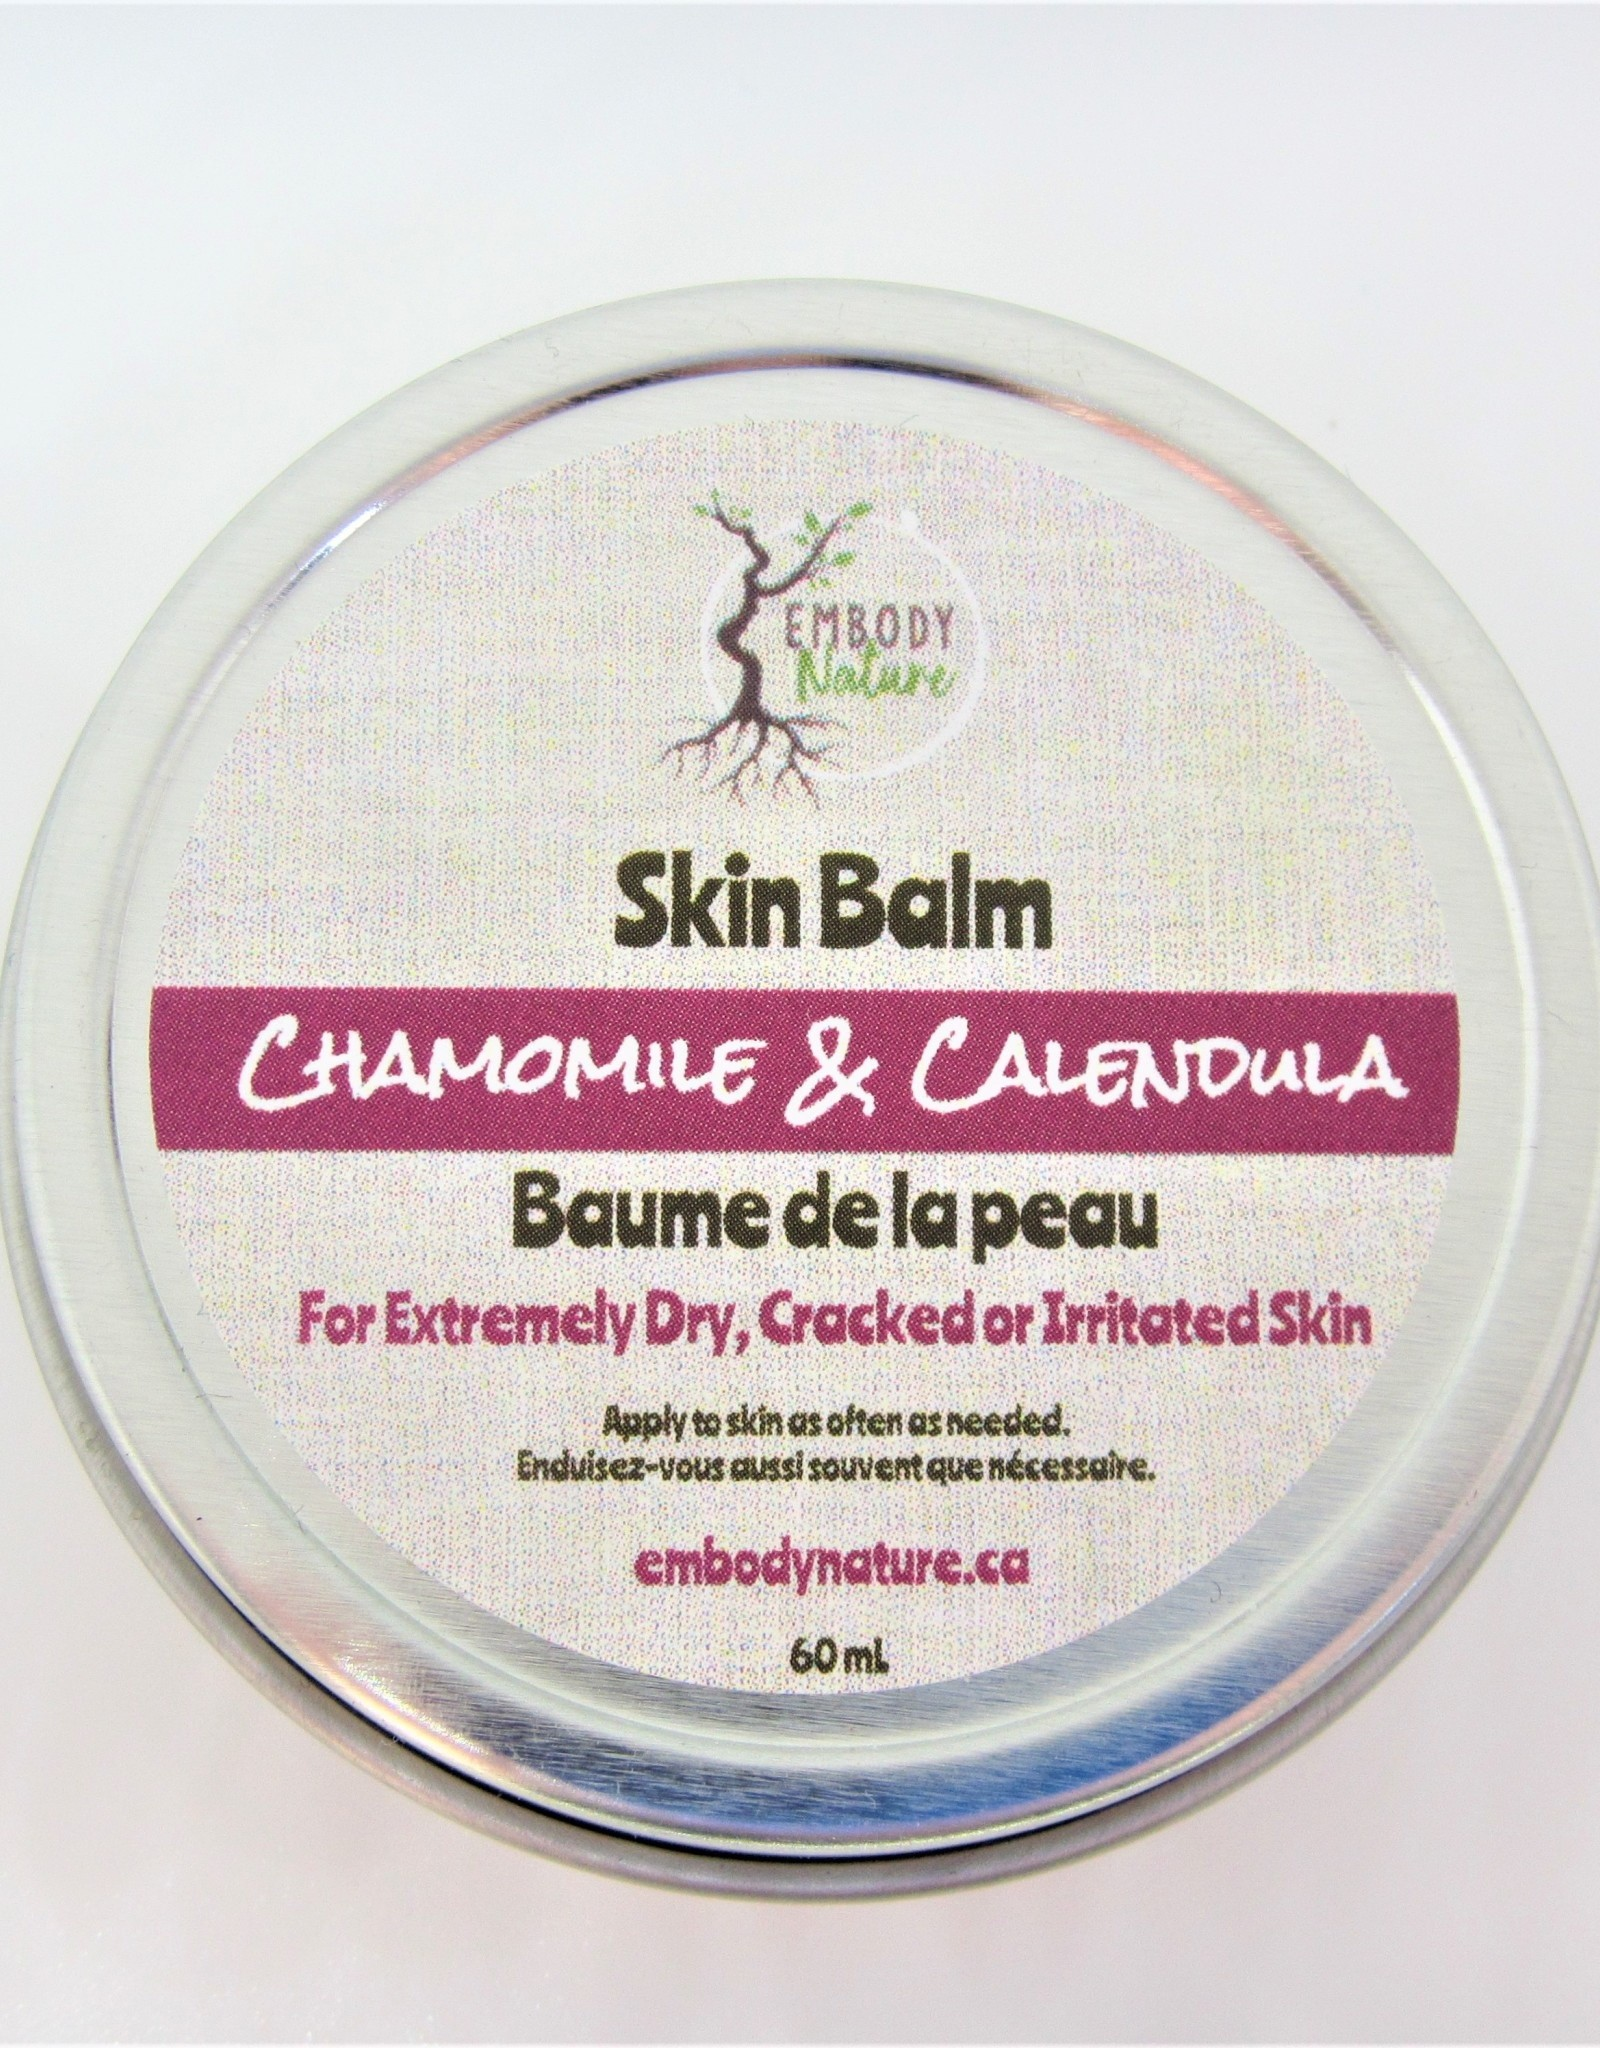 Embody Nature Chamomile & Calendula Skin Balm